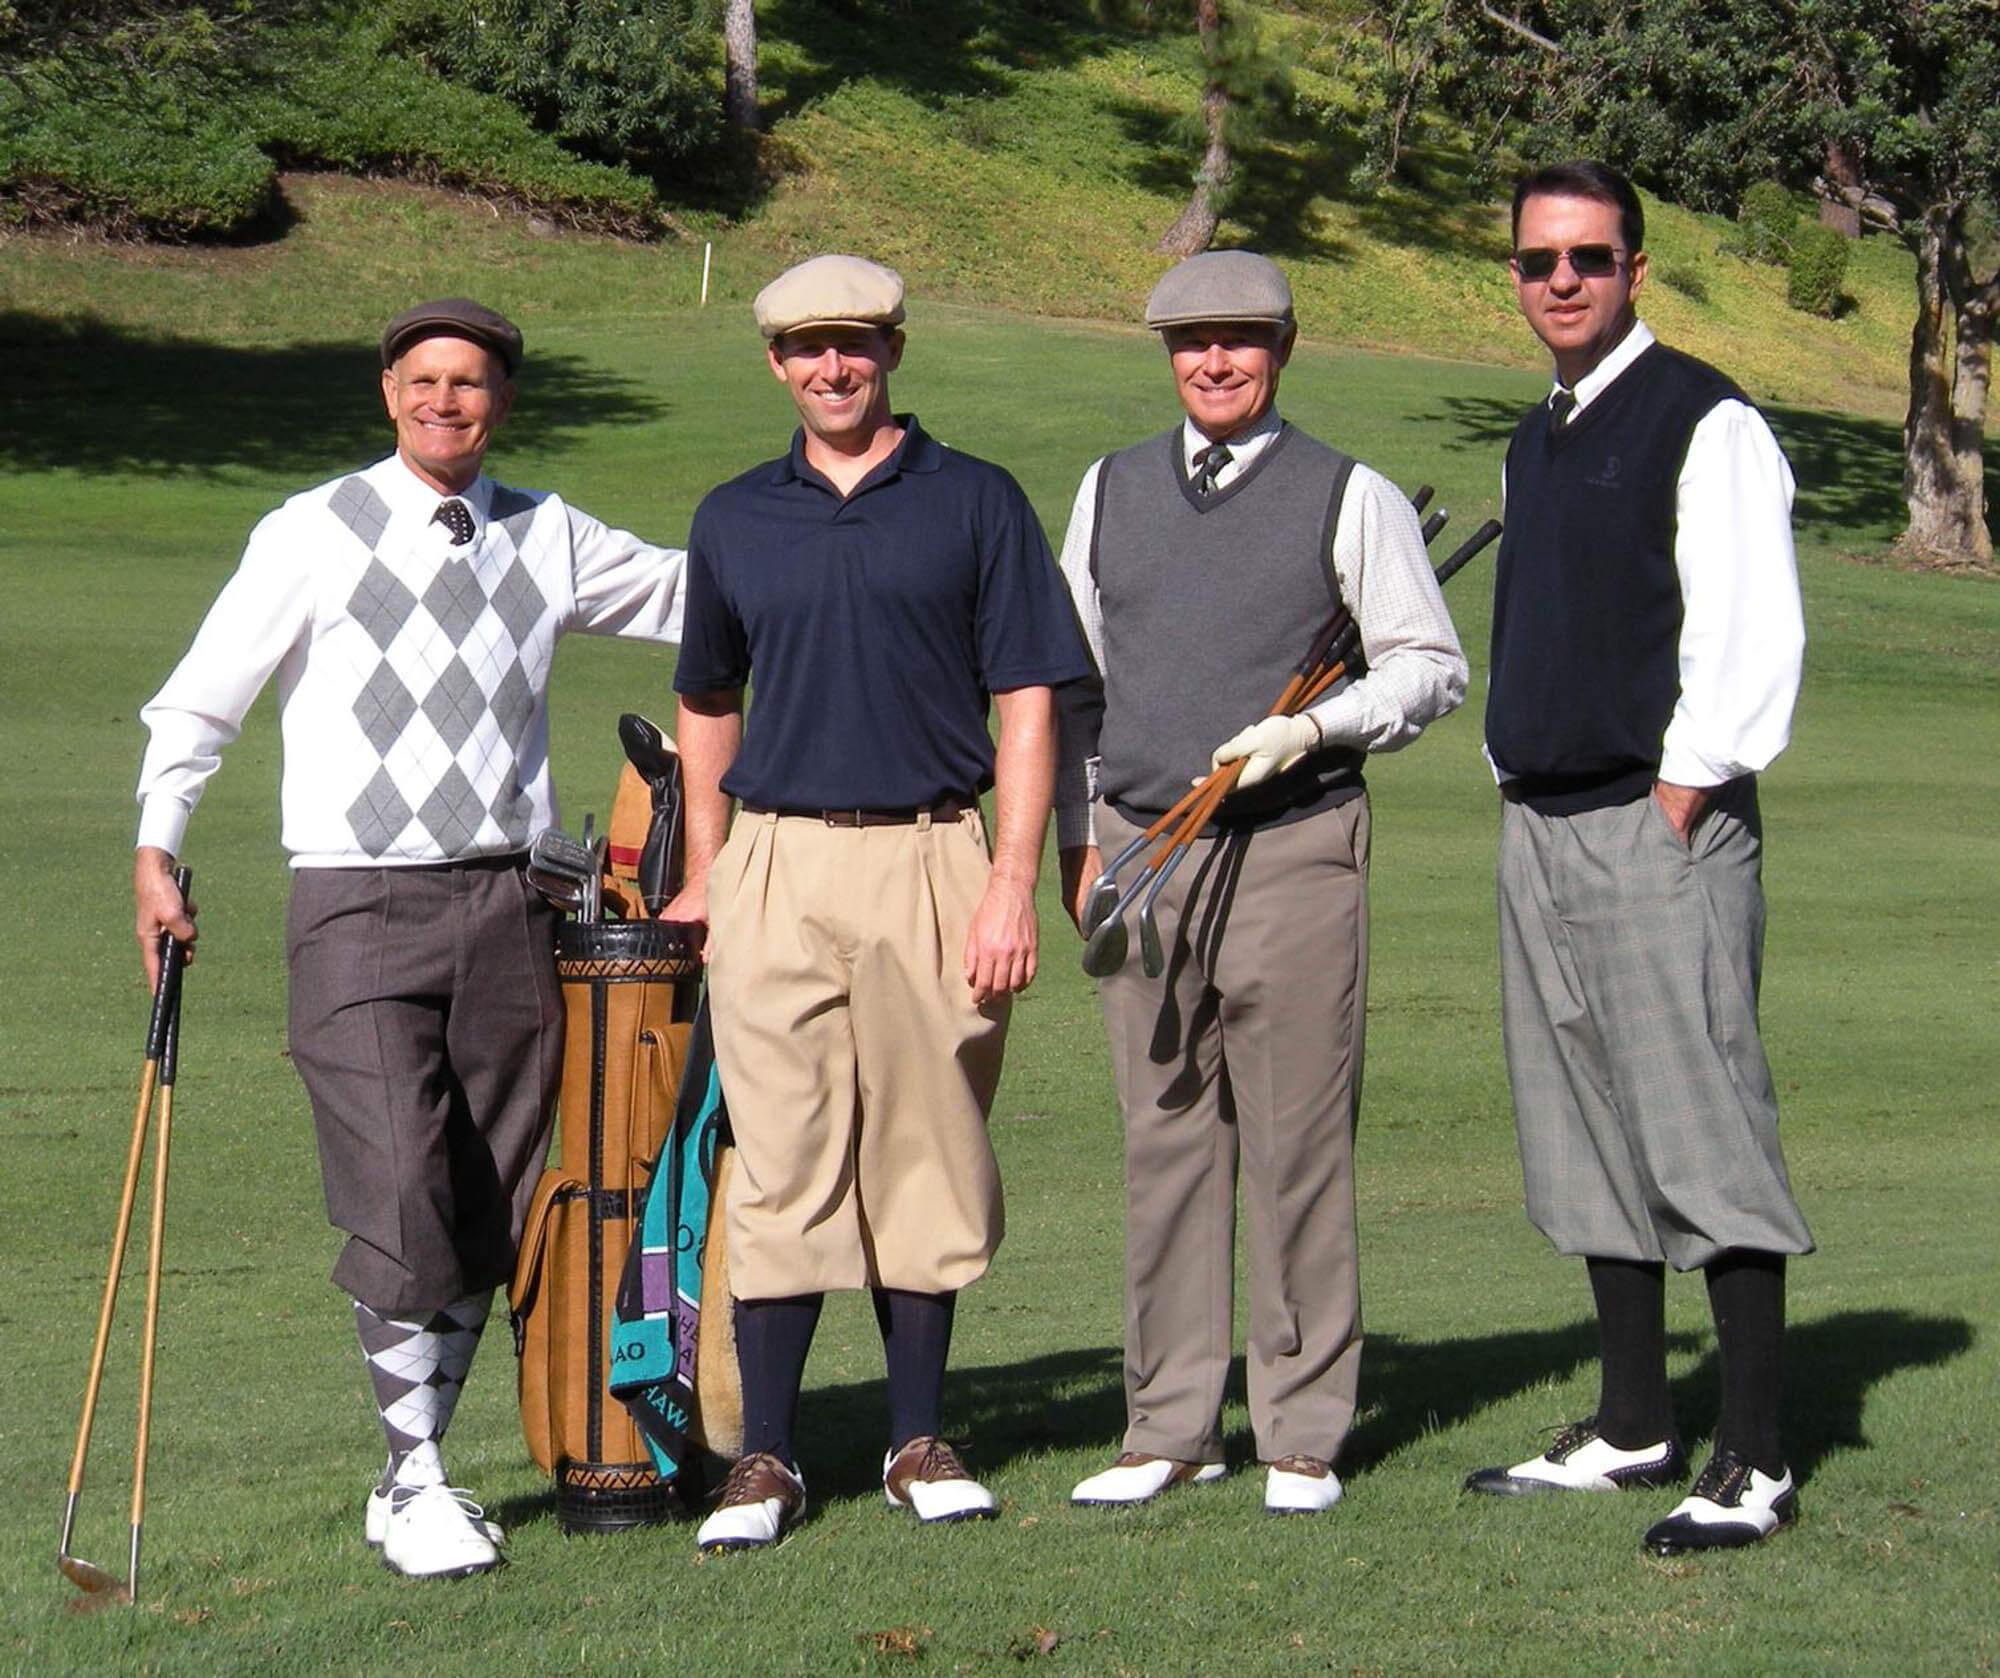 Old Fashioned Golf Shorts